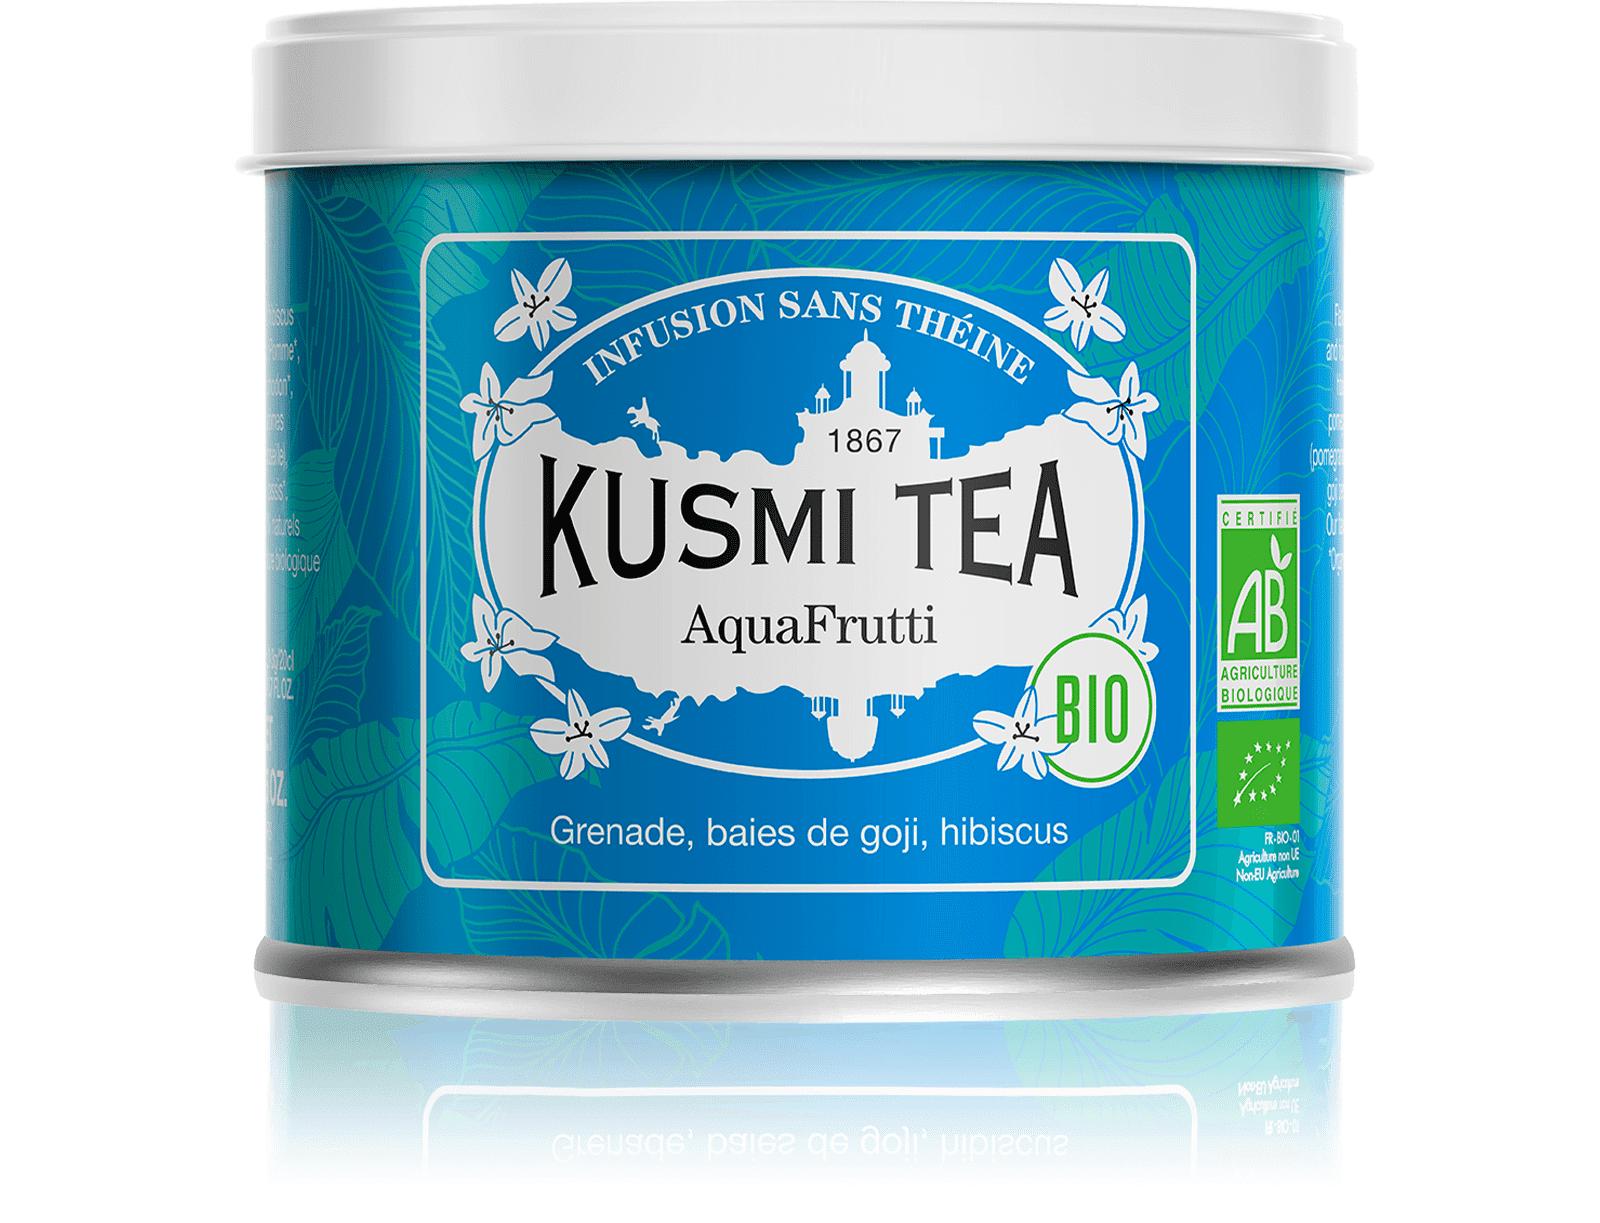 KUSMI TEA AquaFrutti (Infusion de fruits bio) - Infusion hibiscus, baies de goji - Boîte de thé en vrac - Kusmi Tea